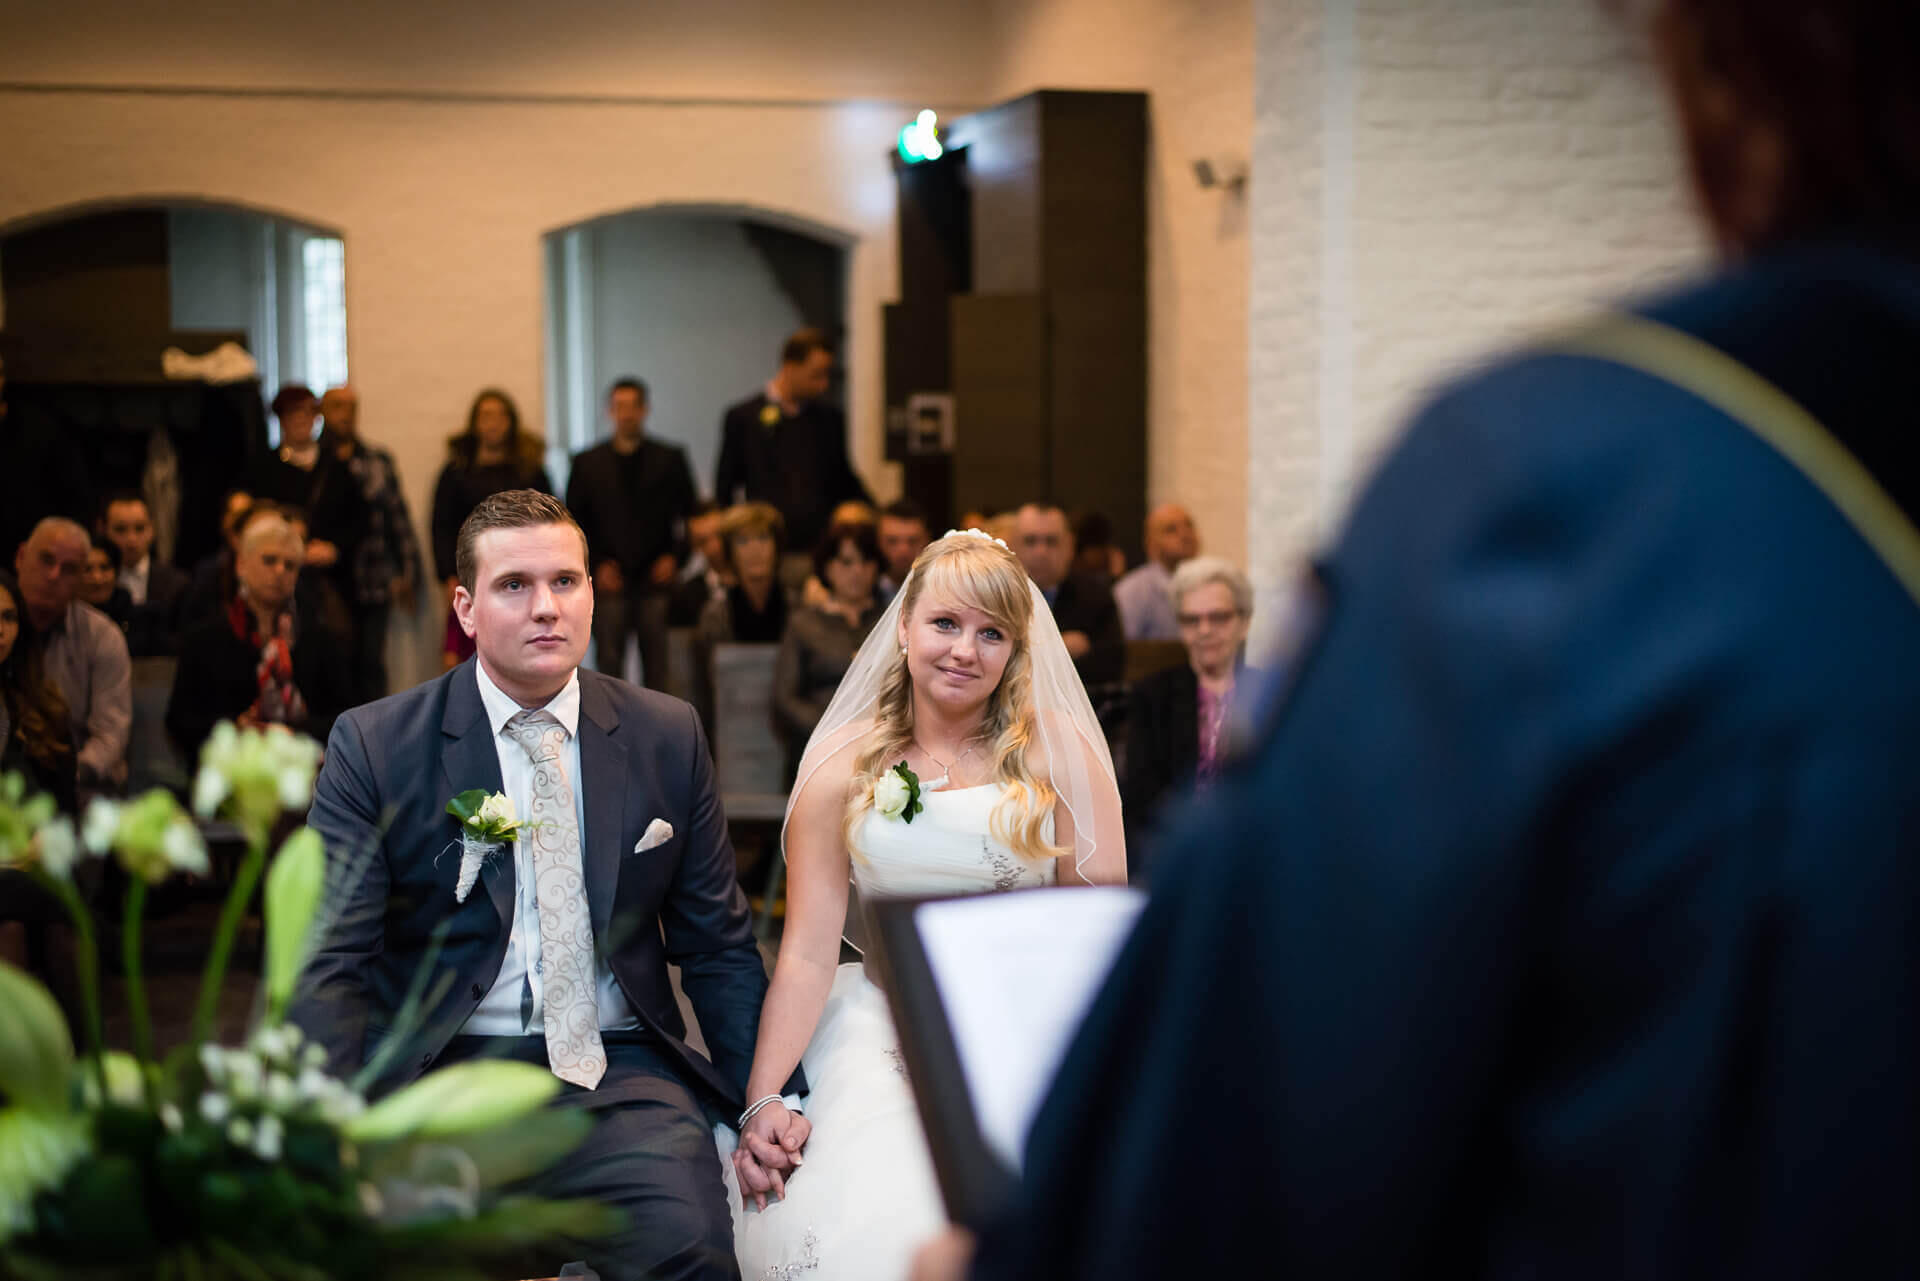 Bruiloft fotograaf sint Agatha kapel door bruidsfotograaf Sandy Peters